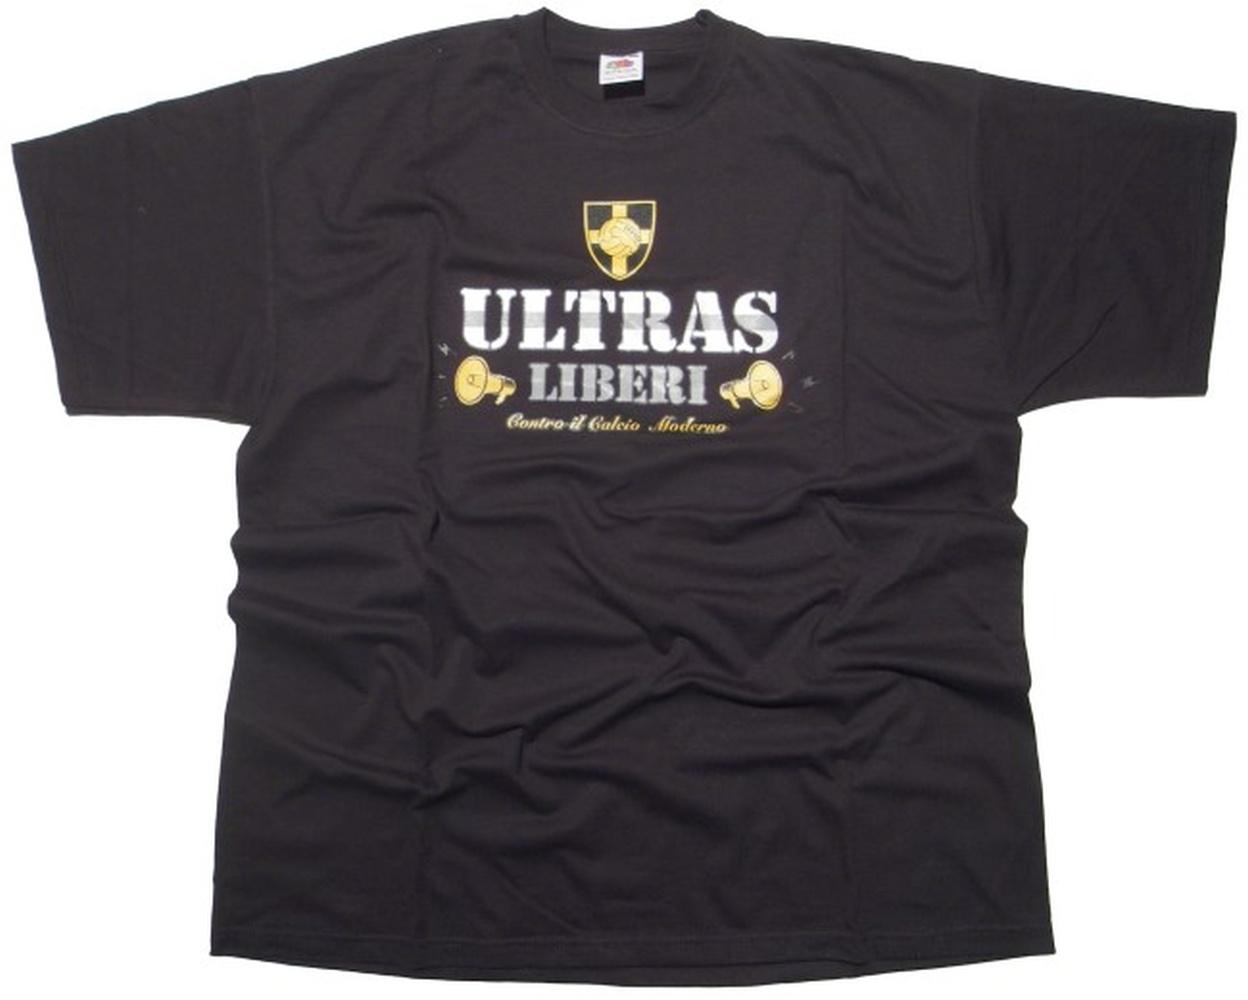 T-Shirt Ultras Liberi